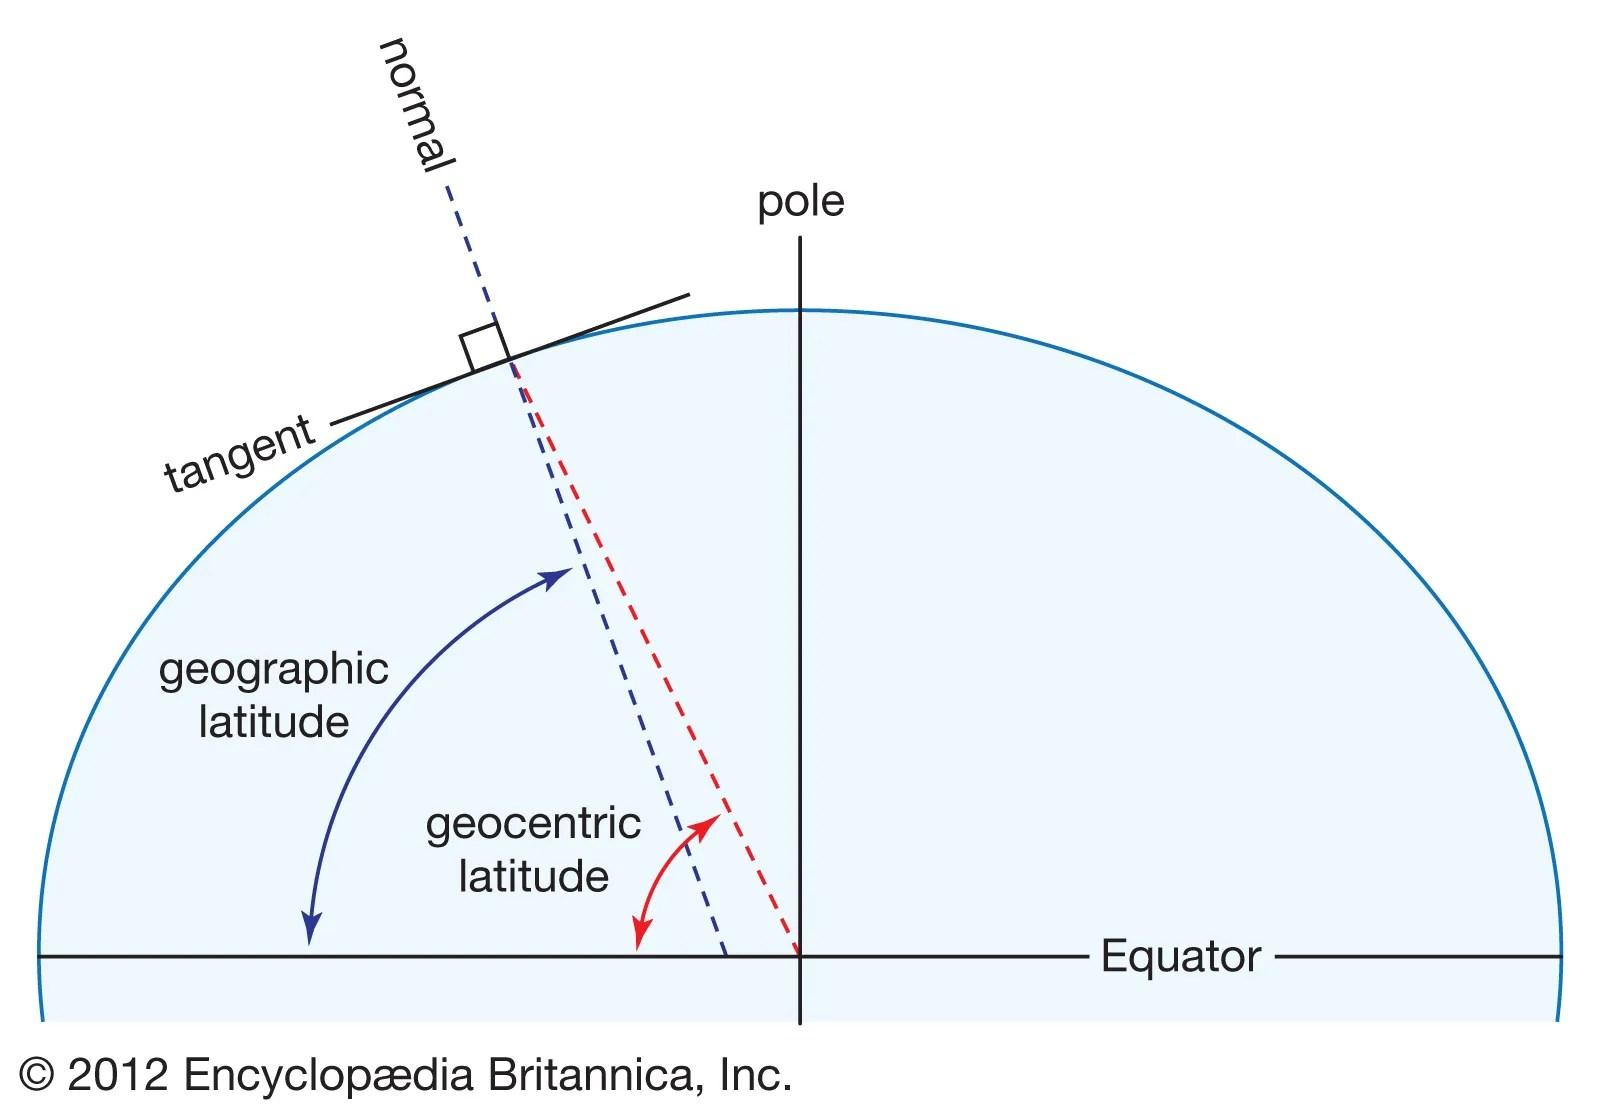 Blank World Map With Longitude And Latitude Lines